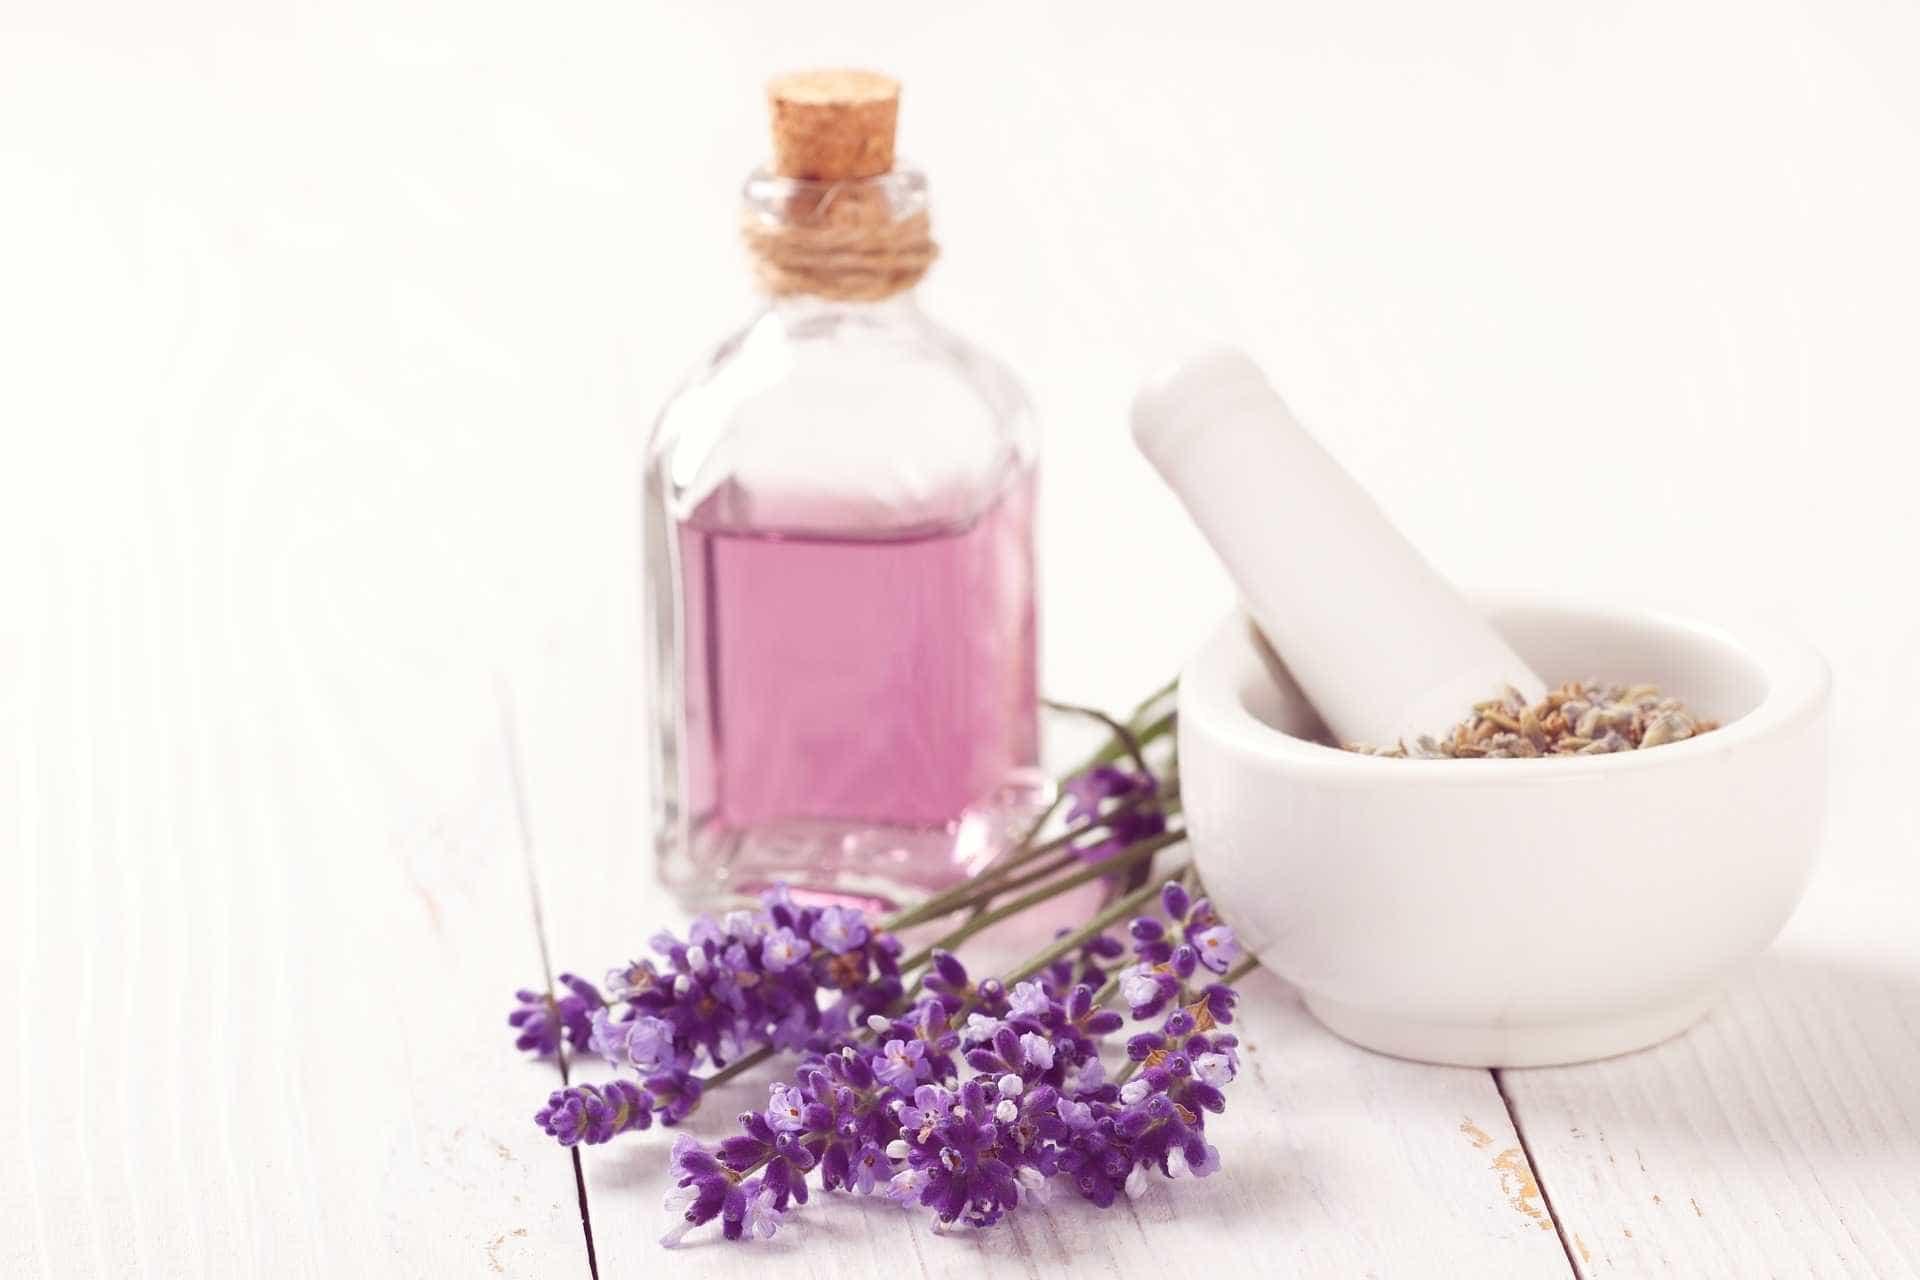 SUS incluidez novas terapias alternativas, como aromaterapia